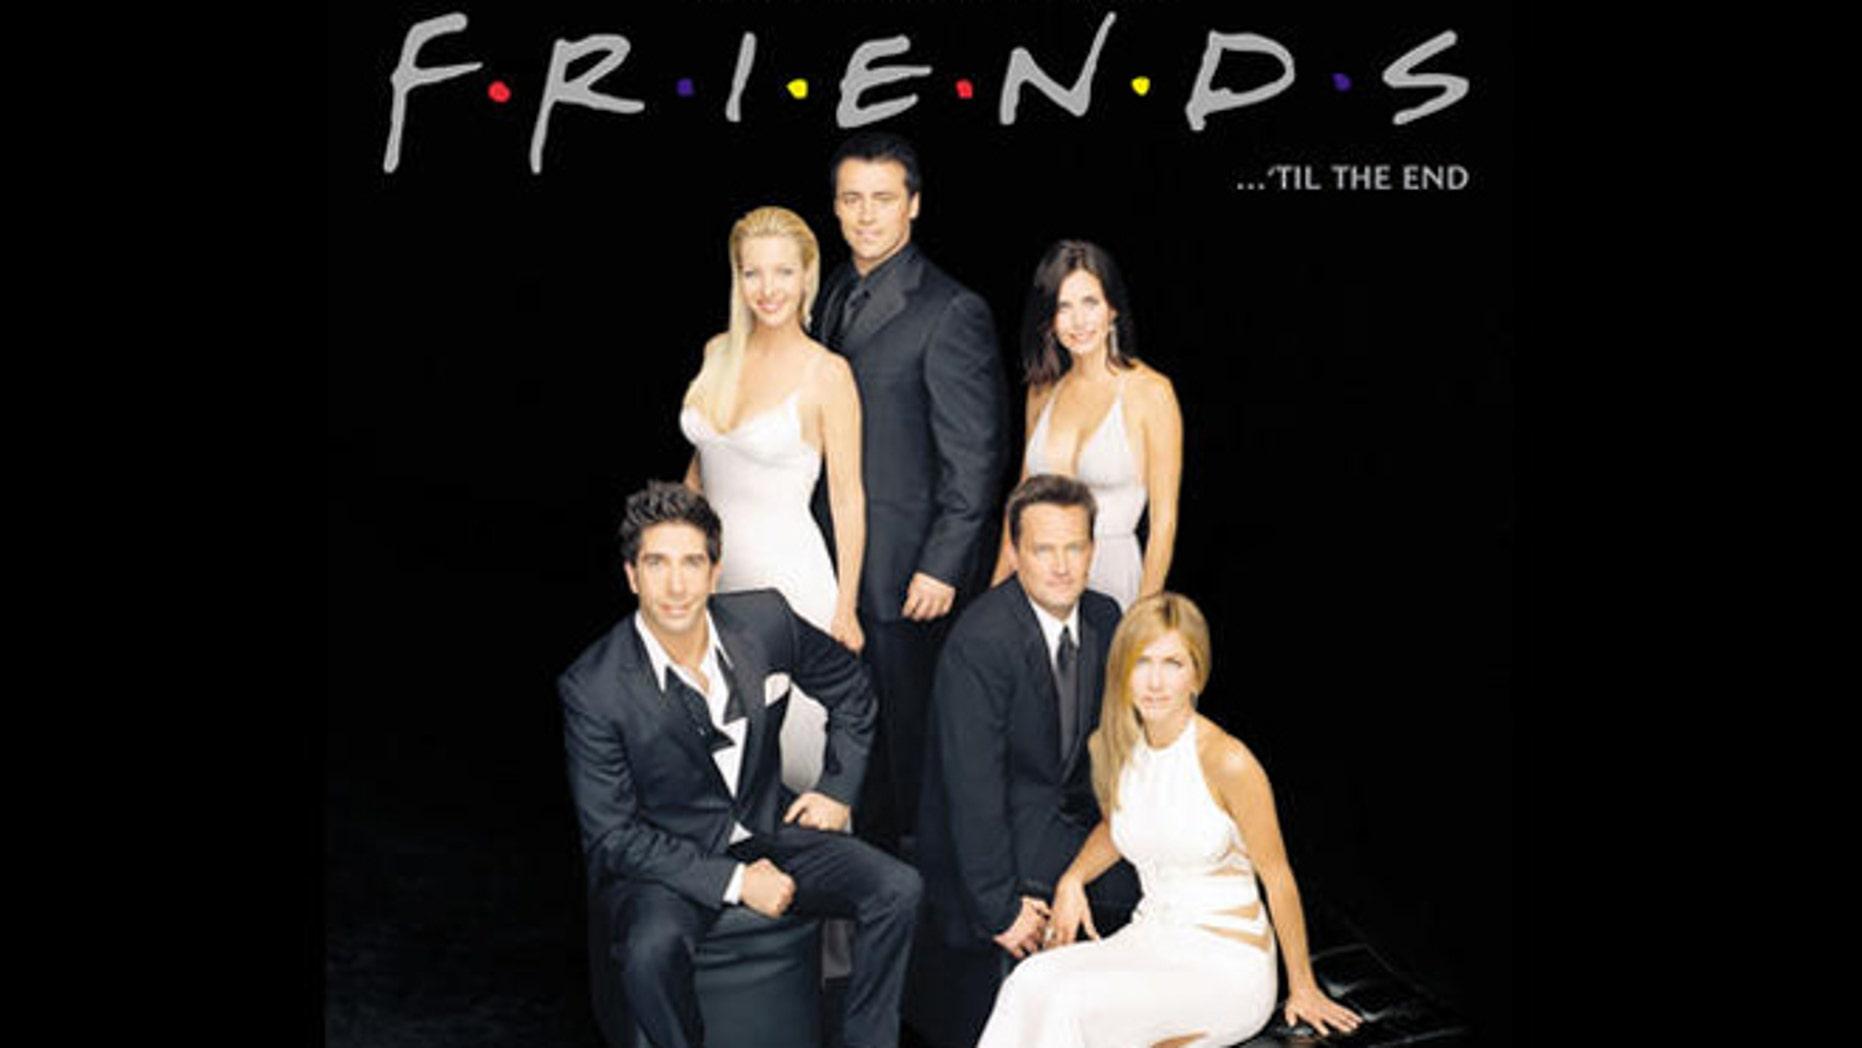 """Friends ... 'Til The End,"" book cover with tv series cast: David Schwimmer, Lisa Kudrow, Matt LeBlanc, Courteney Cox Arquette, Matthew Perry, and Jennifer Aniston."